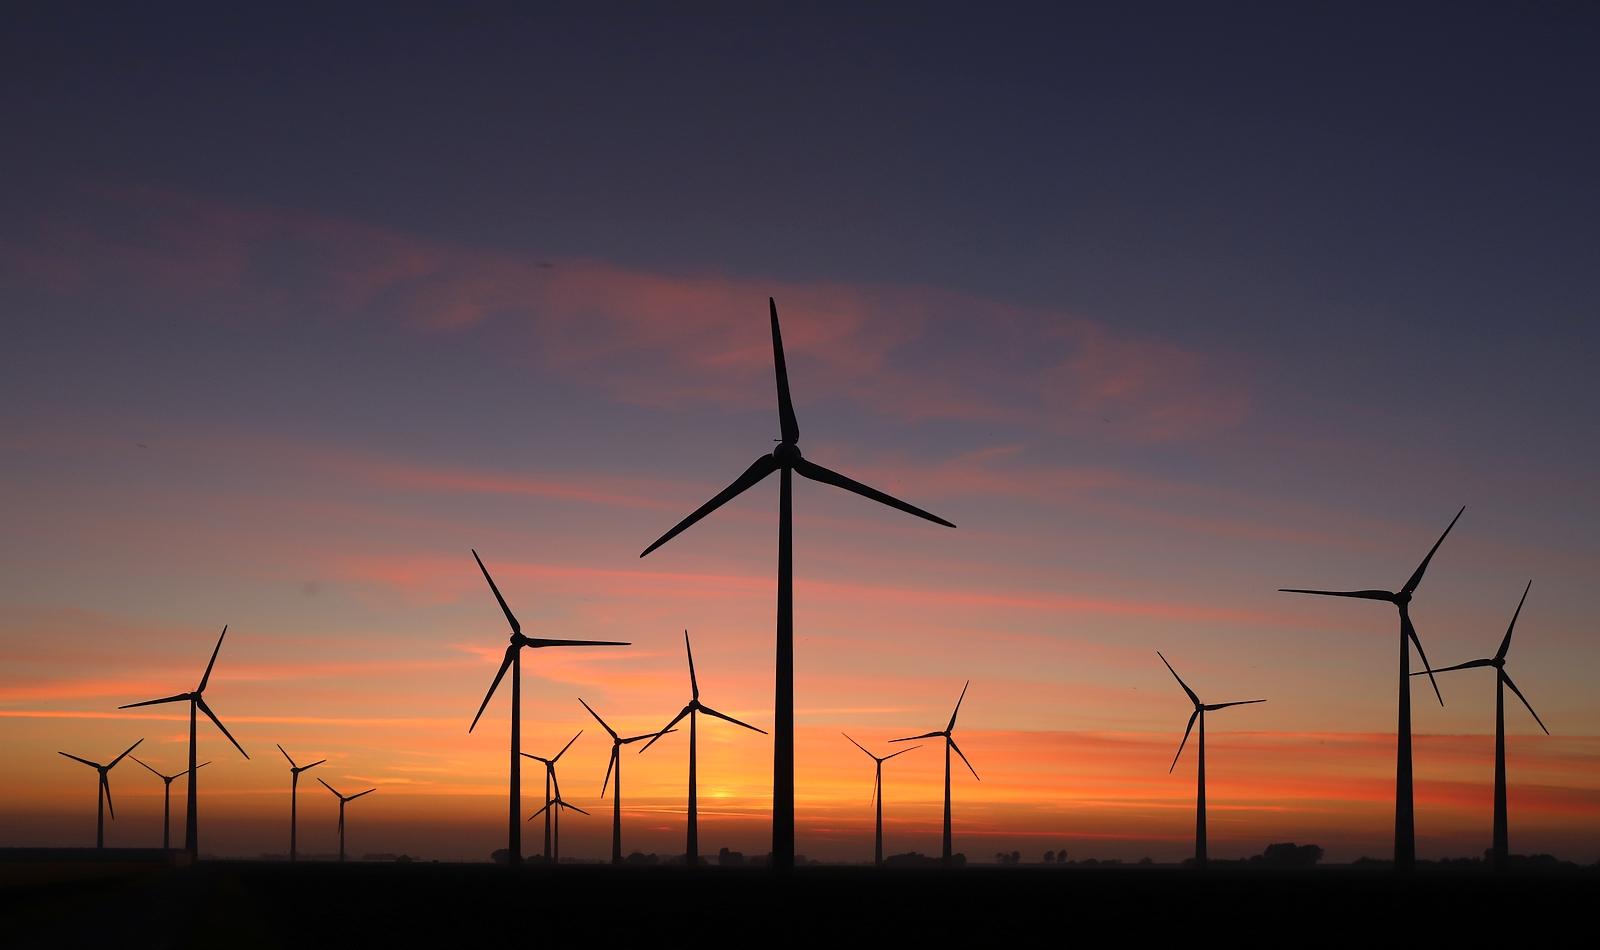 Trennewurth Windpark